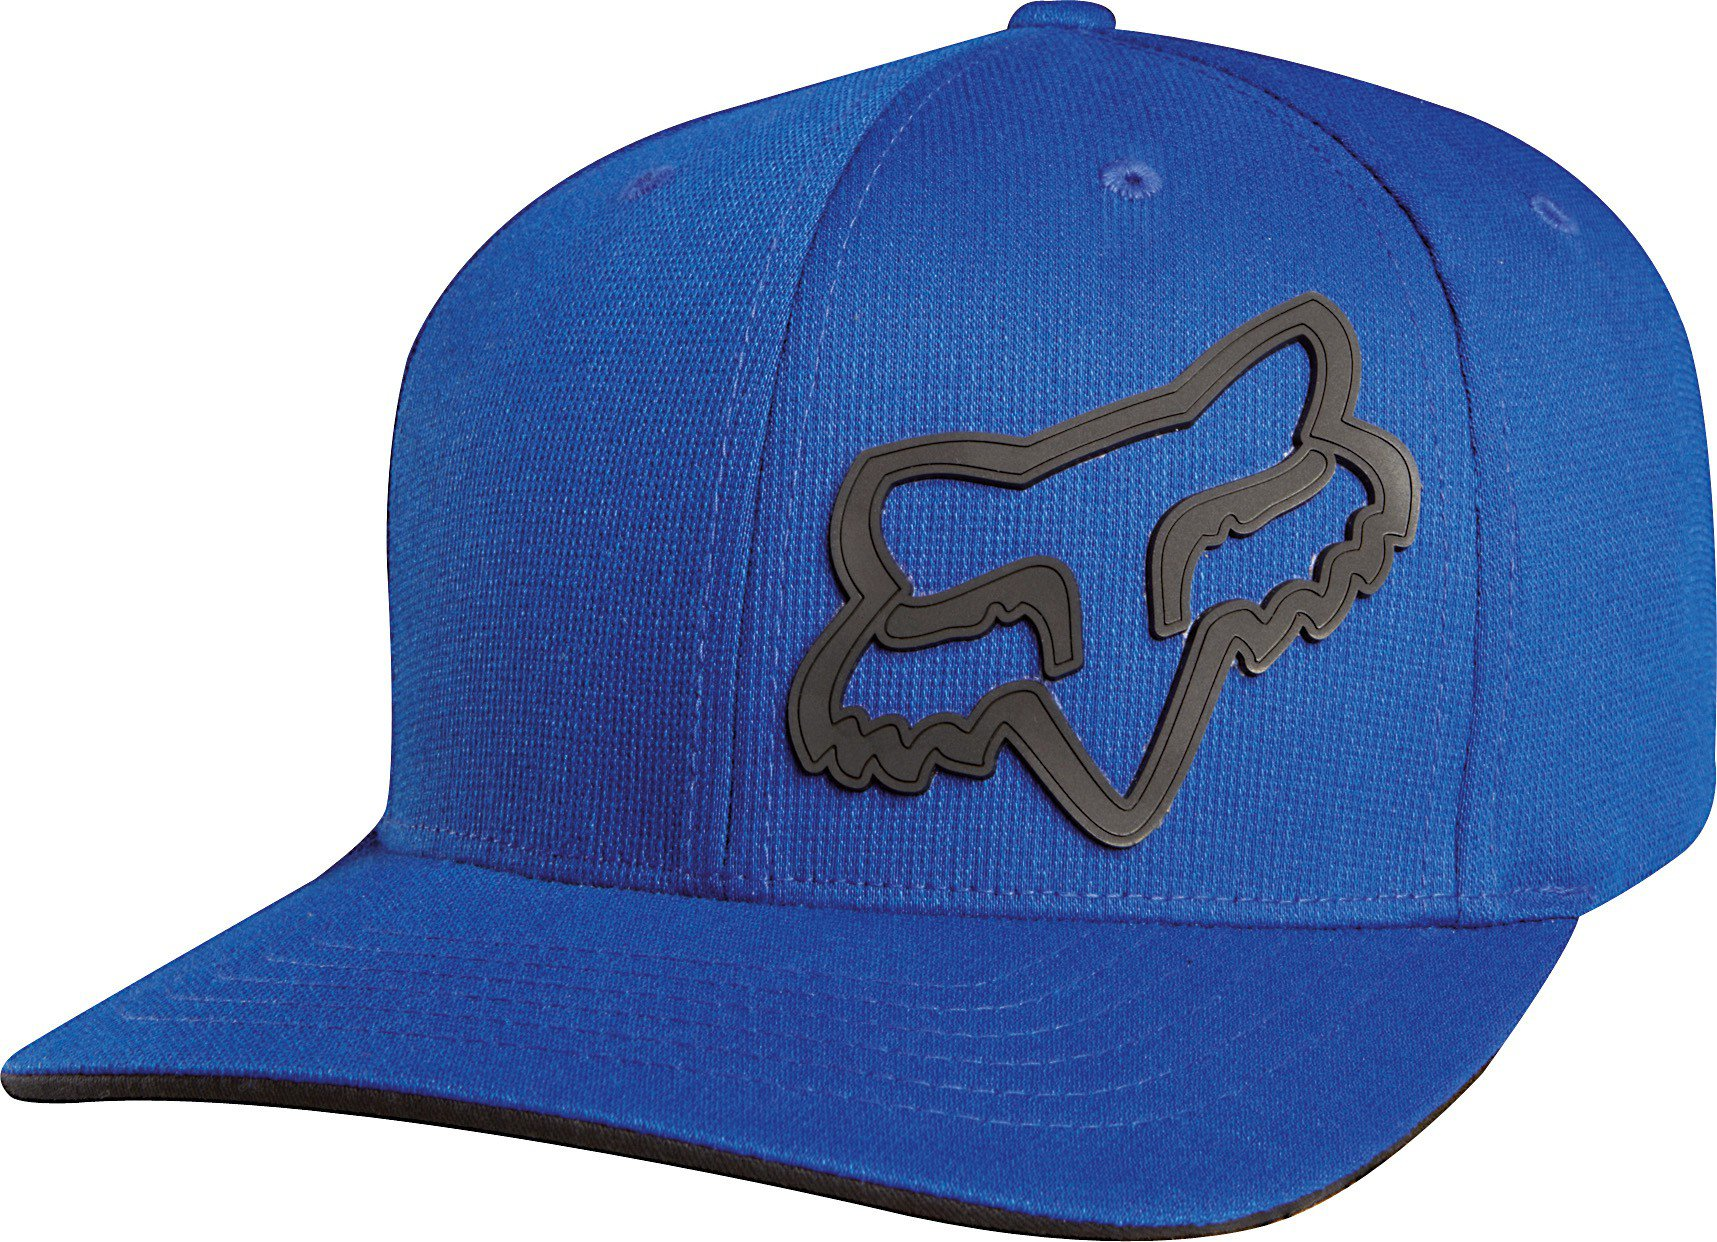 Čepice/Kšiltovka FOX Flexfit Signature modrá